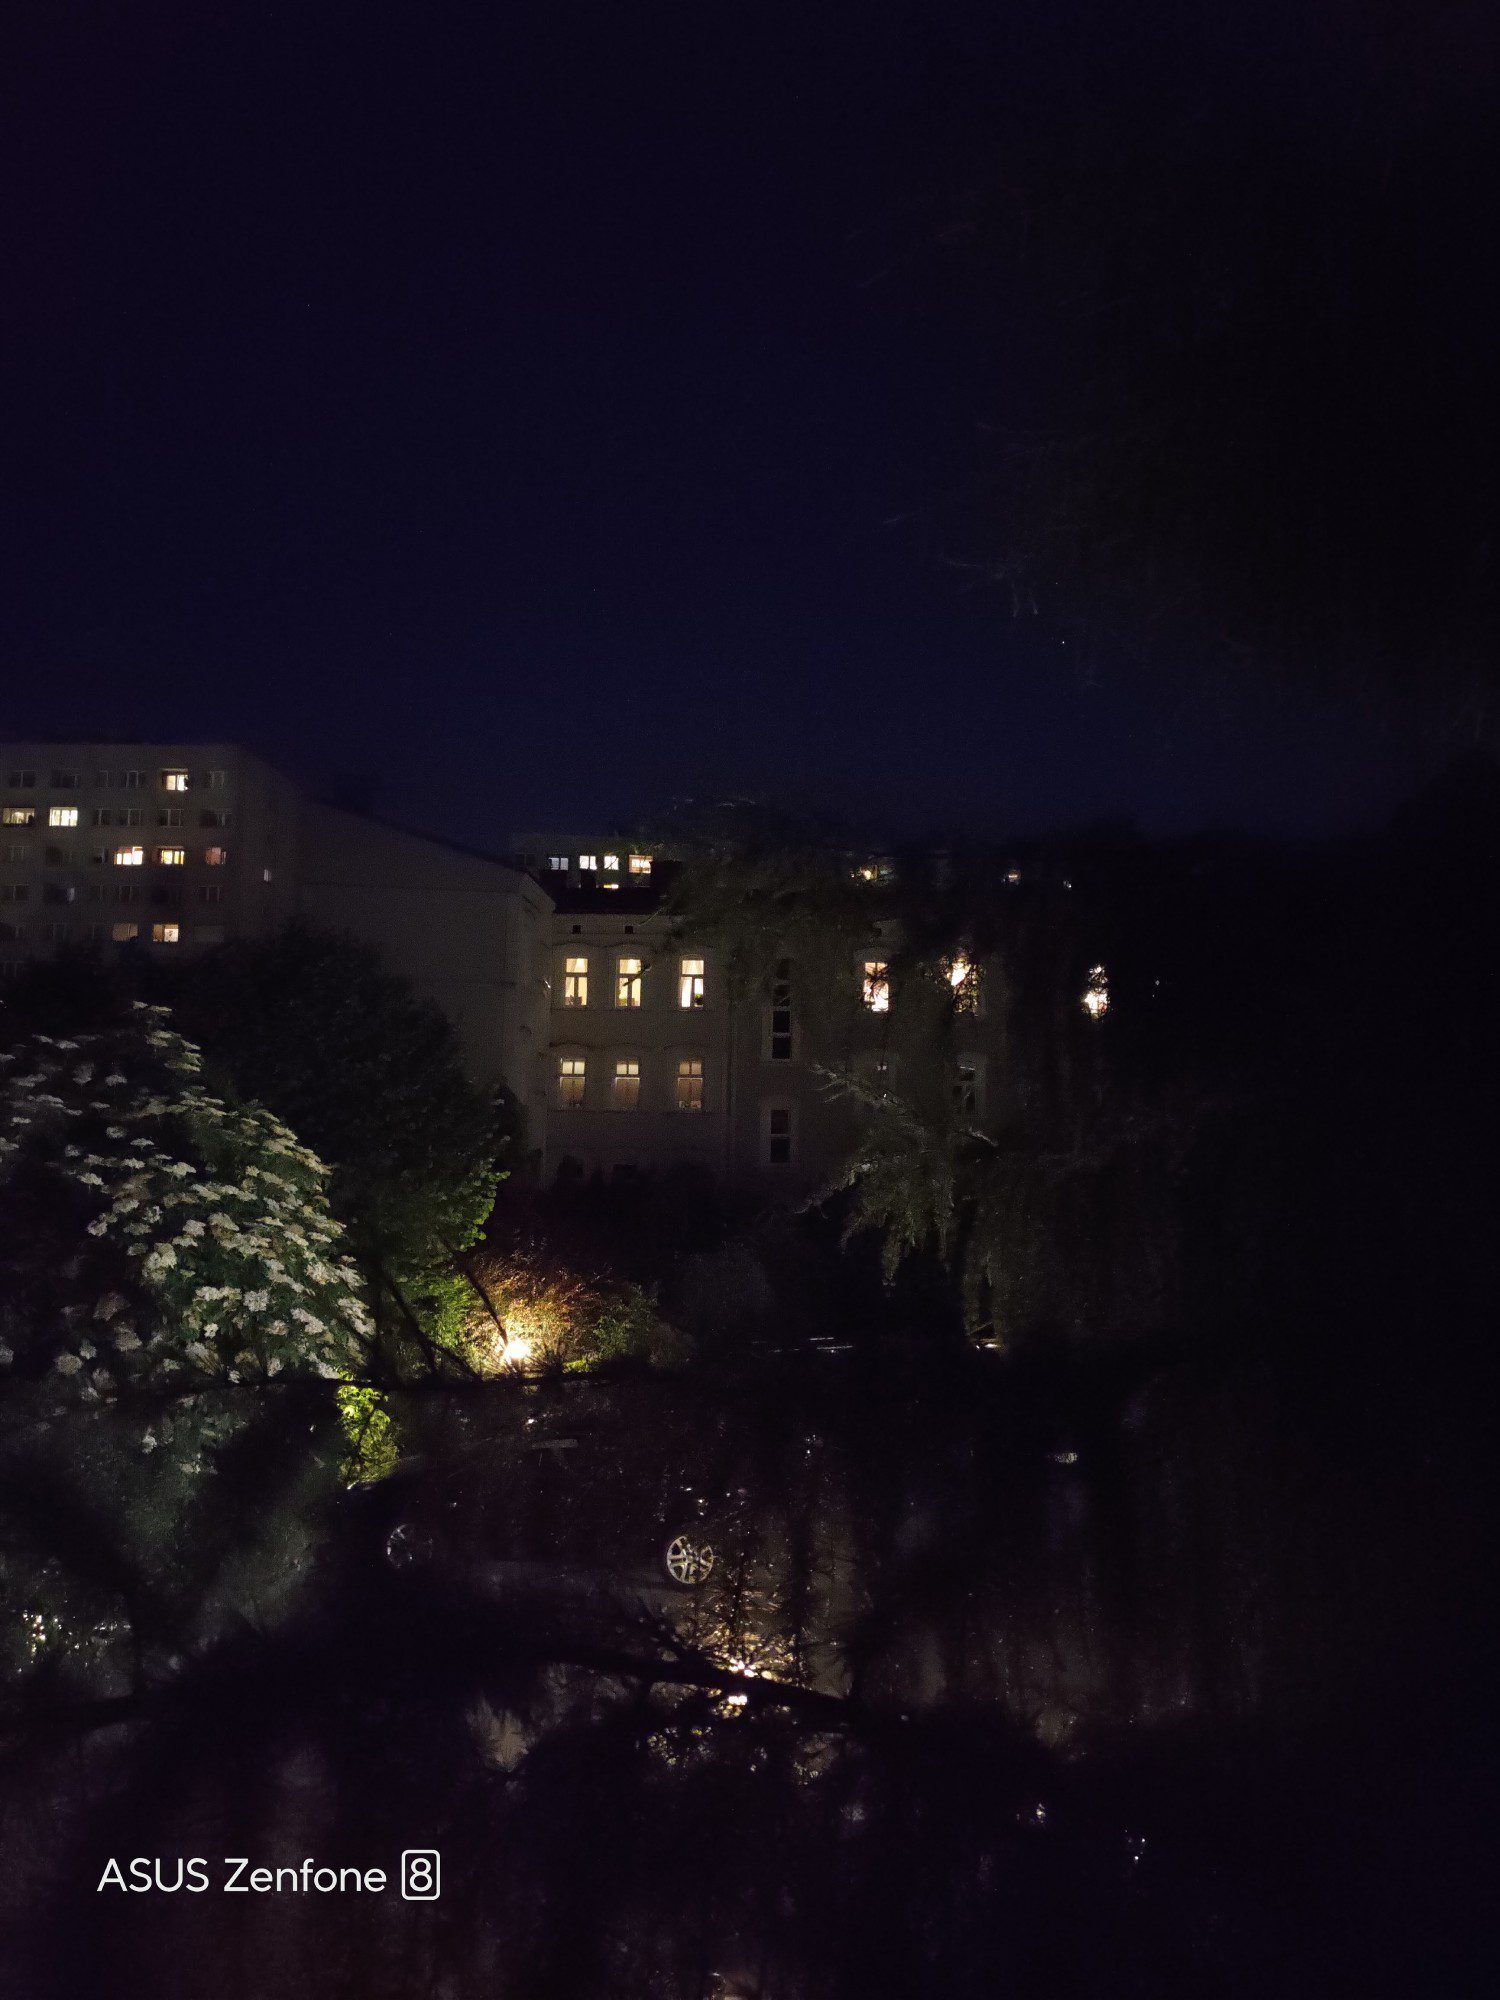 Podwórko nocą aparatem 64 Mpix